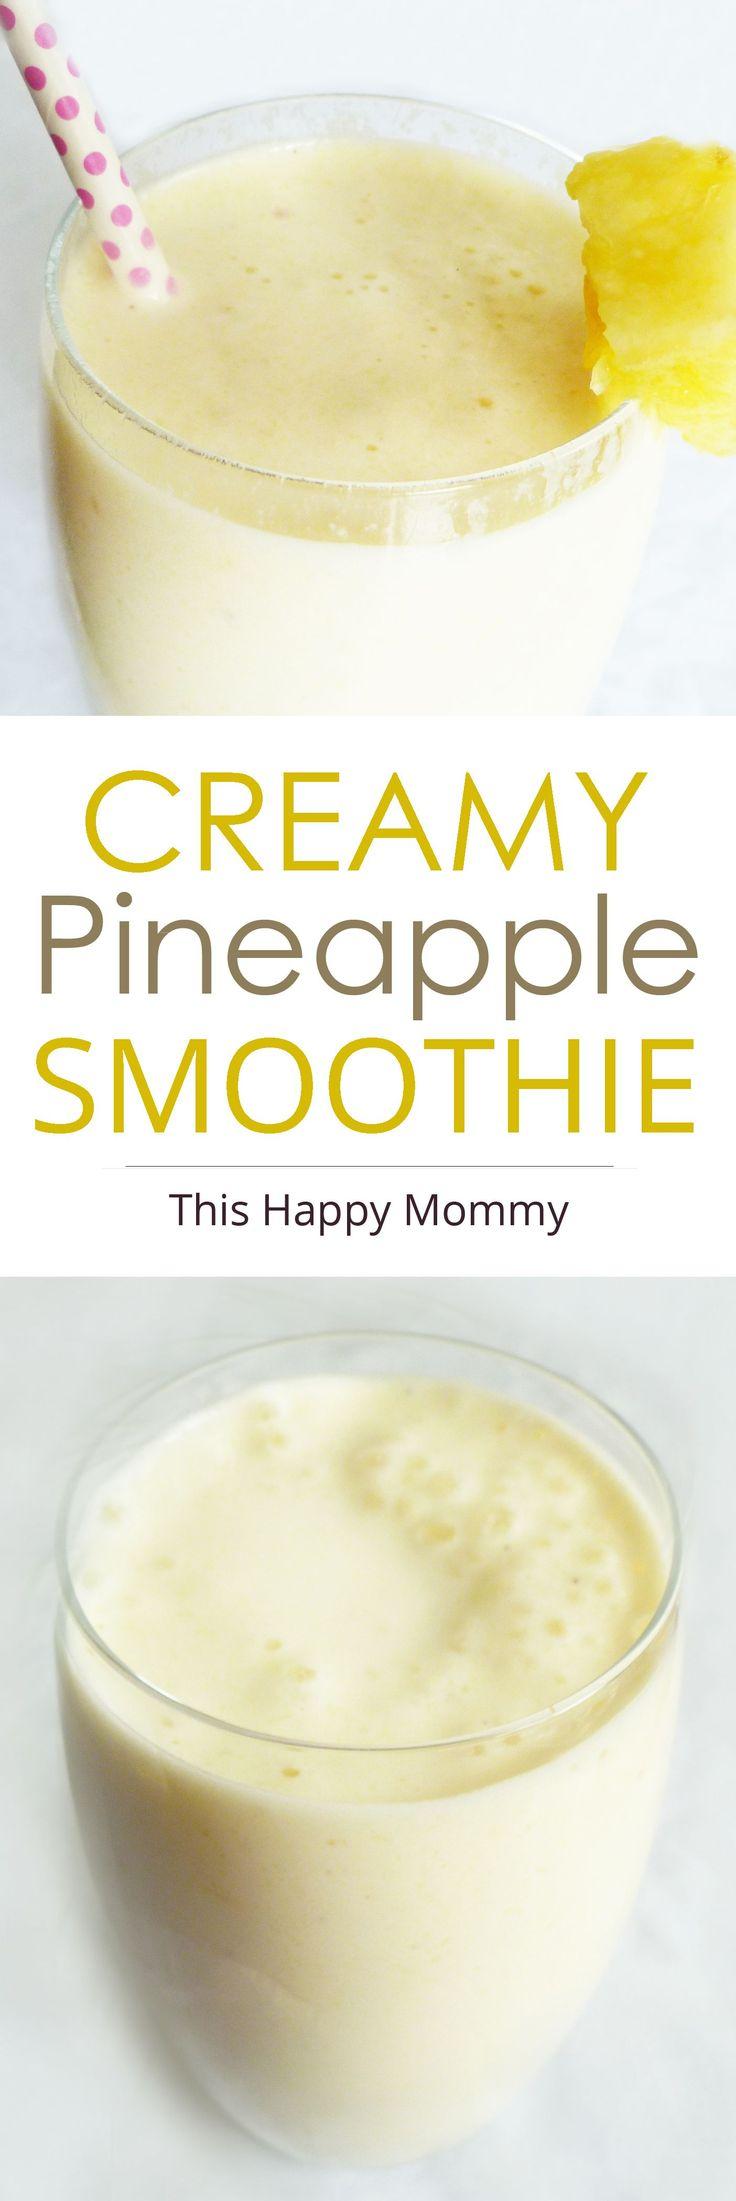 Creamy Pineapple Smoothie